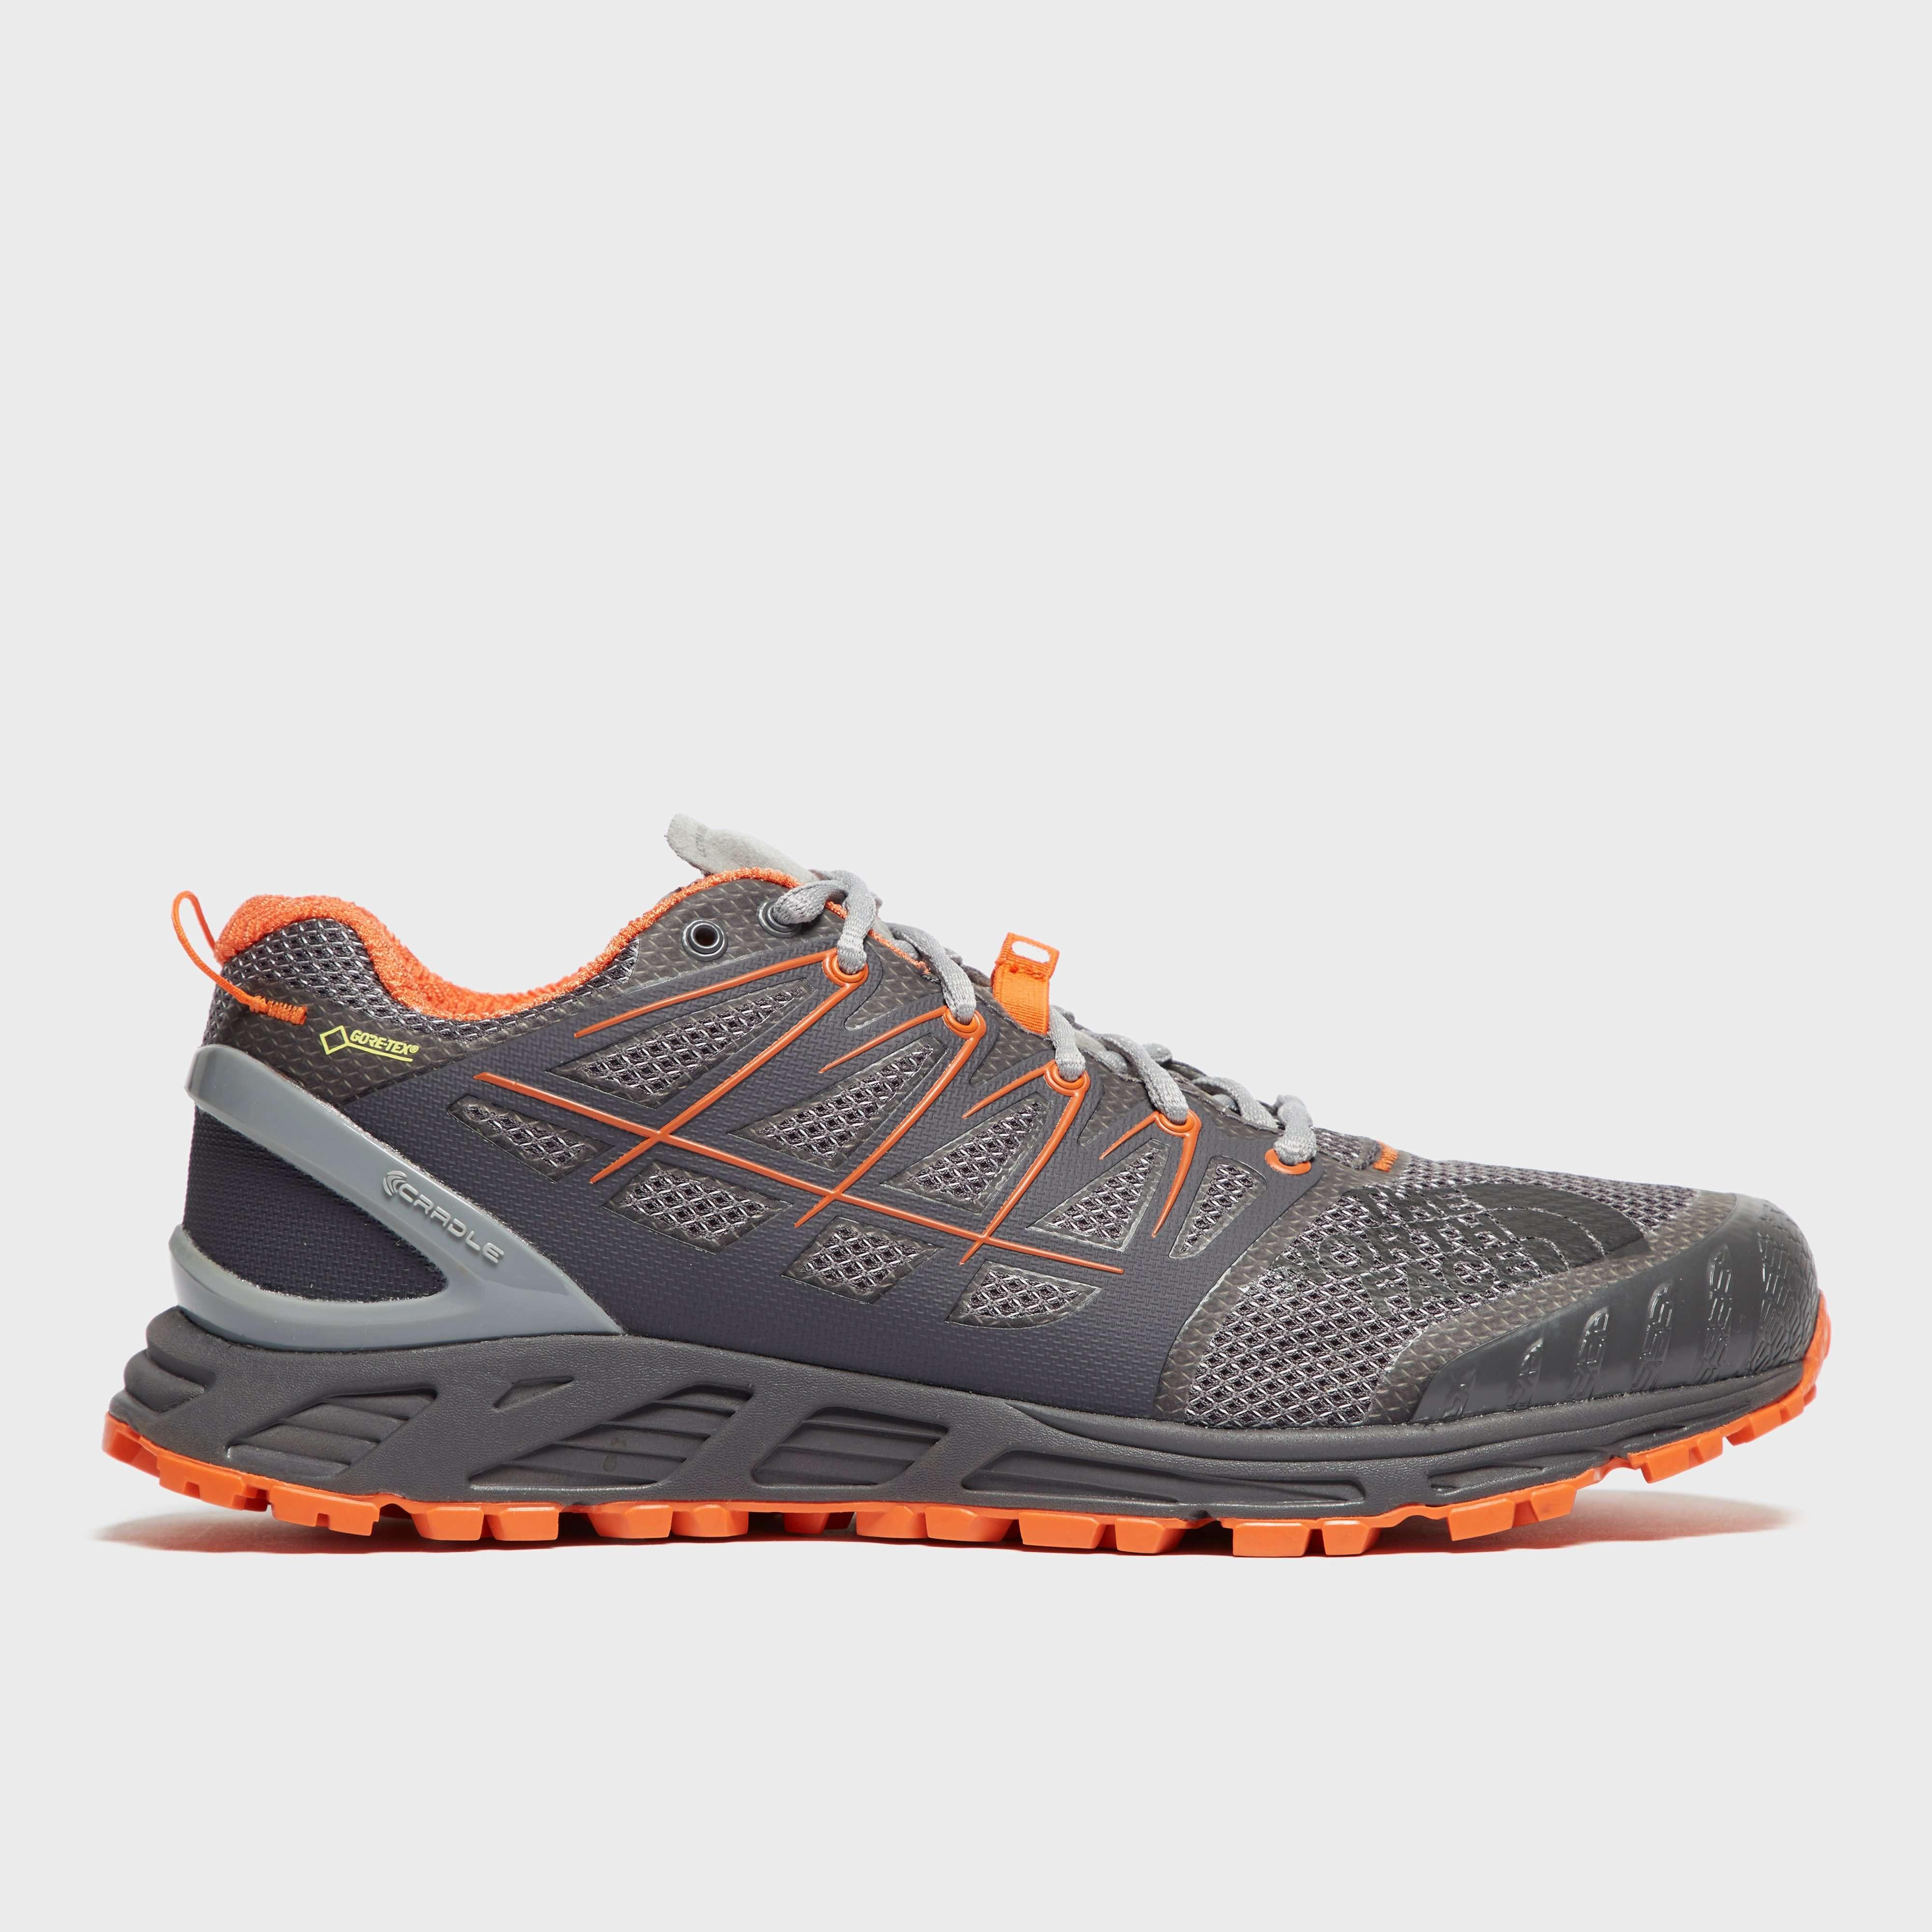 THE NORTH FACE Men's Ultra Endurance II GORE-TEX® Shoe